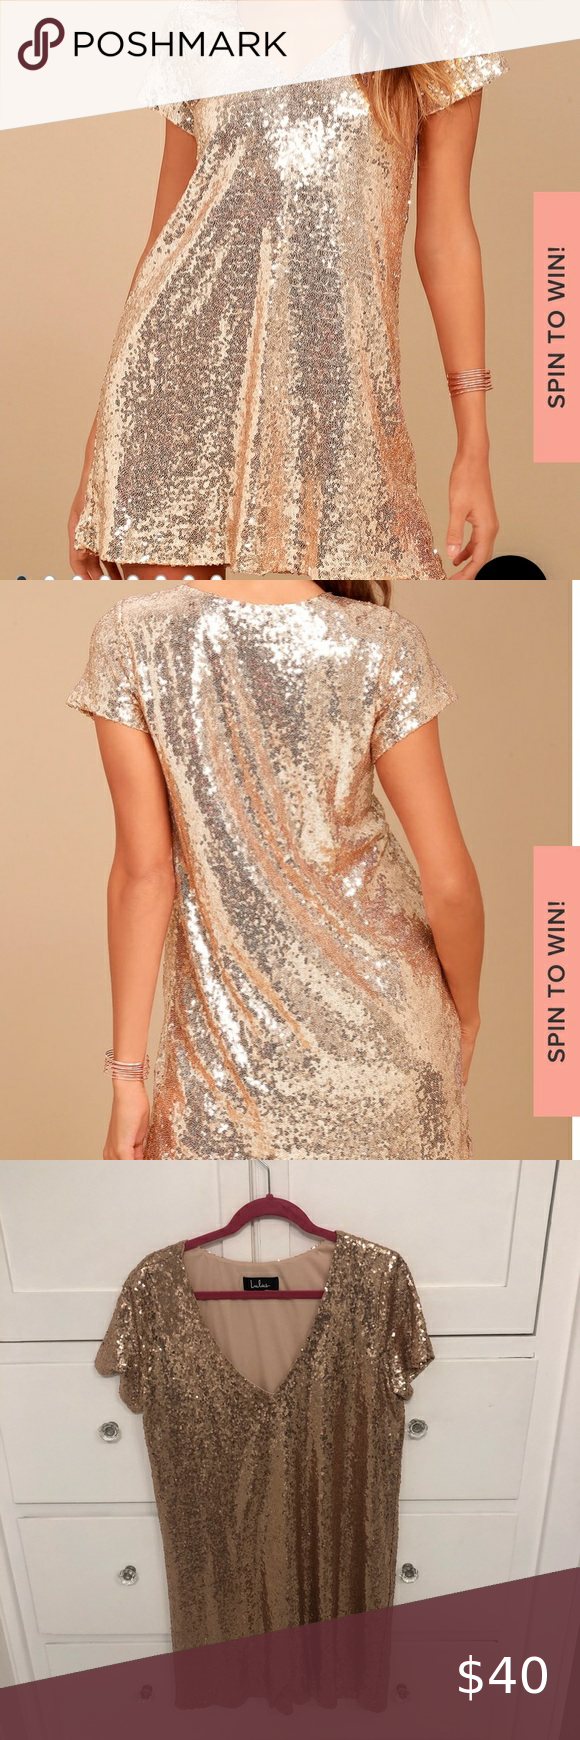 Lulu S Gold Sequin Shift Dress Size L Mini Dress With Sleeves Lulu Lace Dress Black Lace Bodycon Dress [ 1740 x 580 Pixel ]